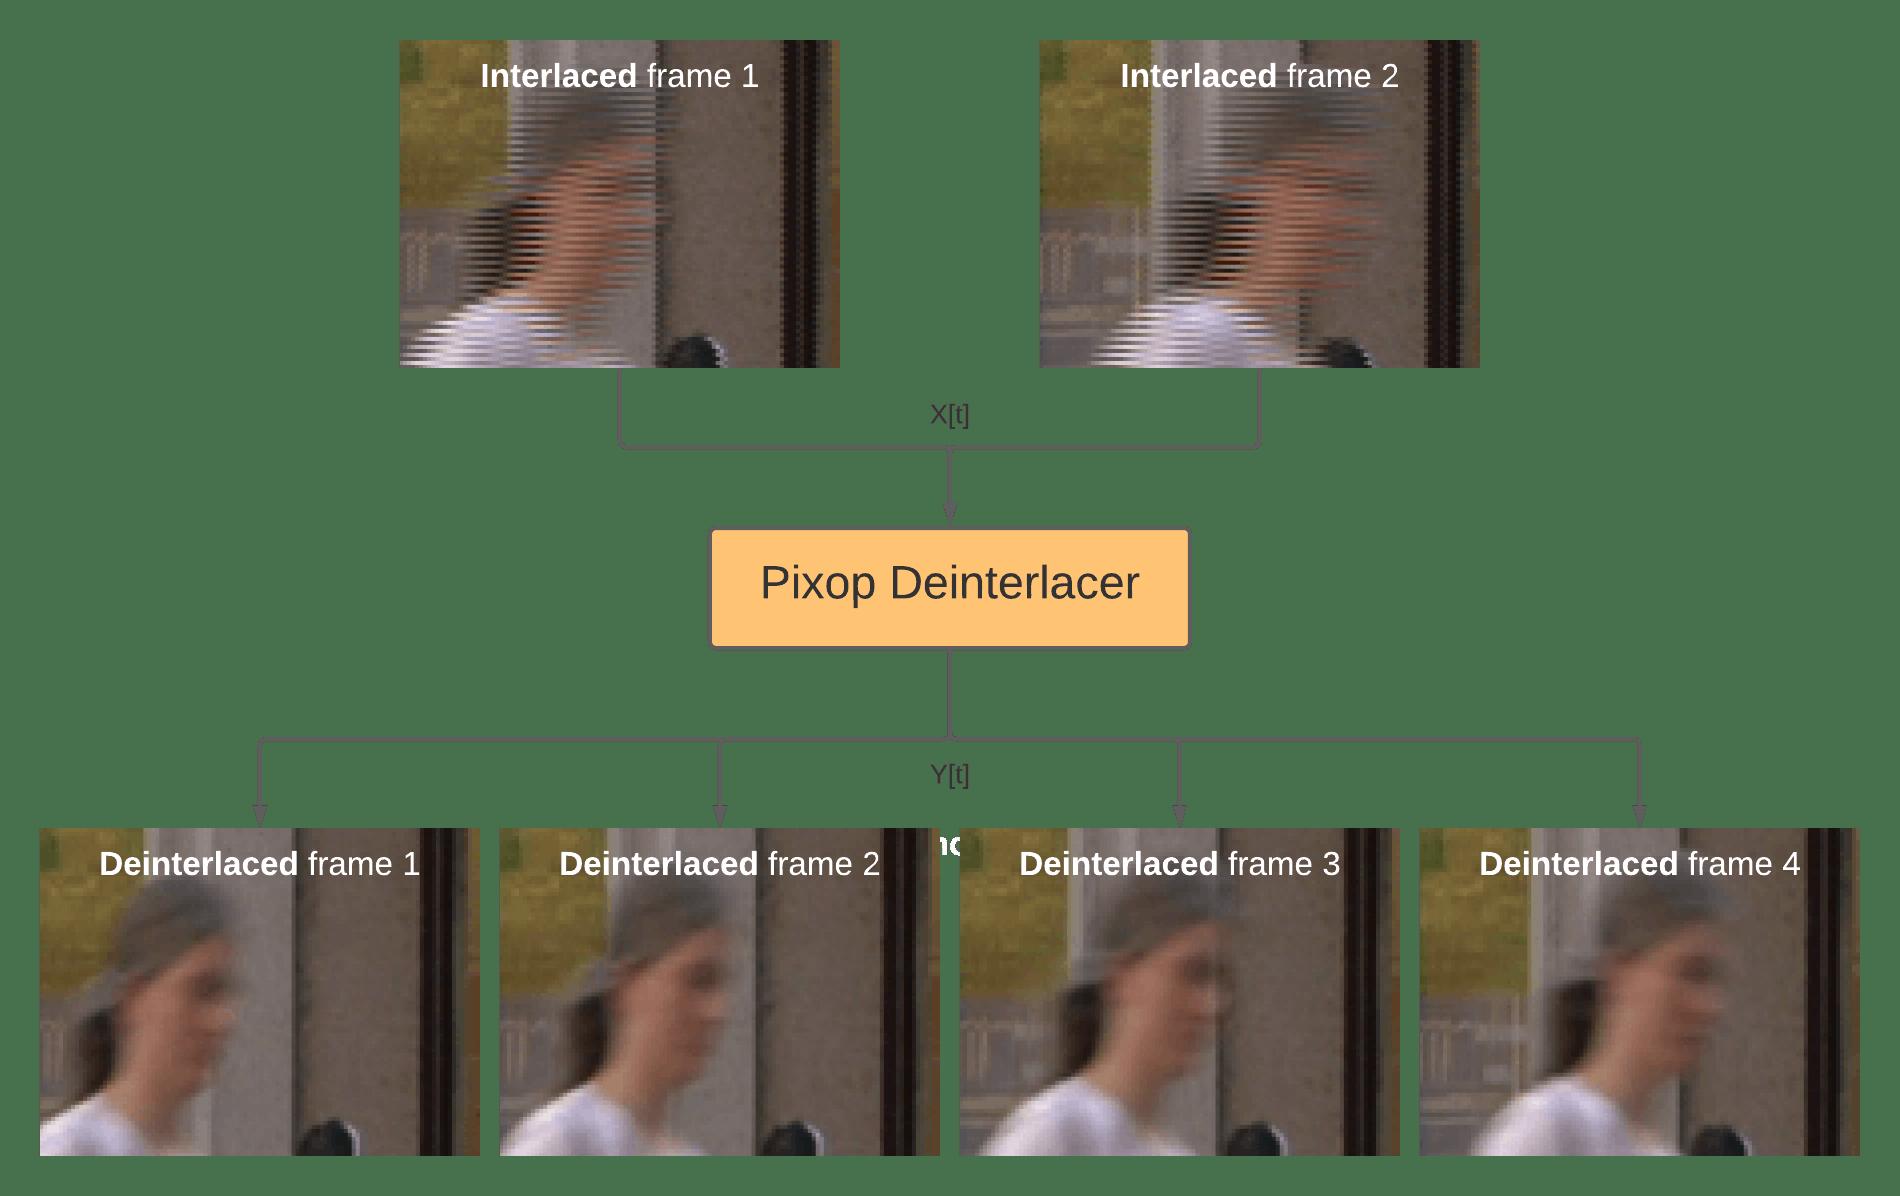 Composite image of woman's face put through the Pixop deinterlacer filter